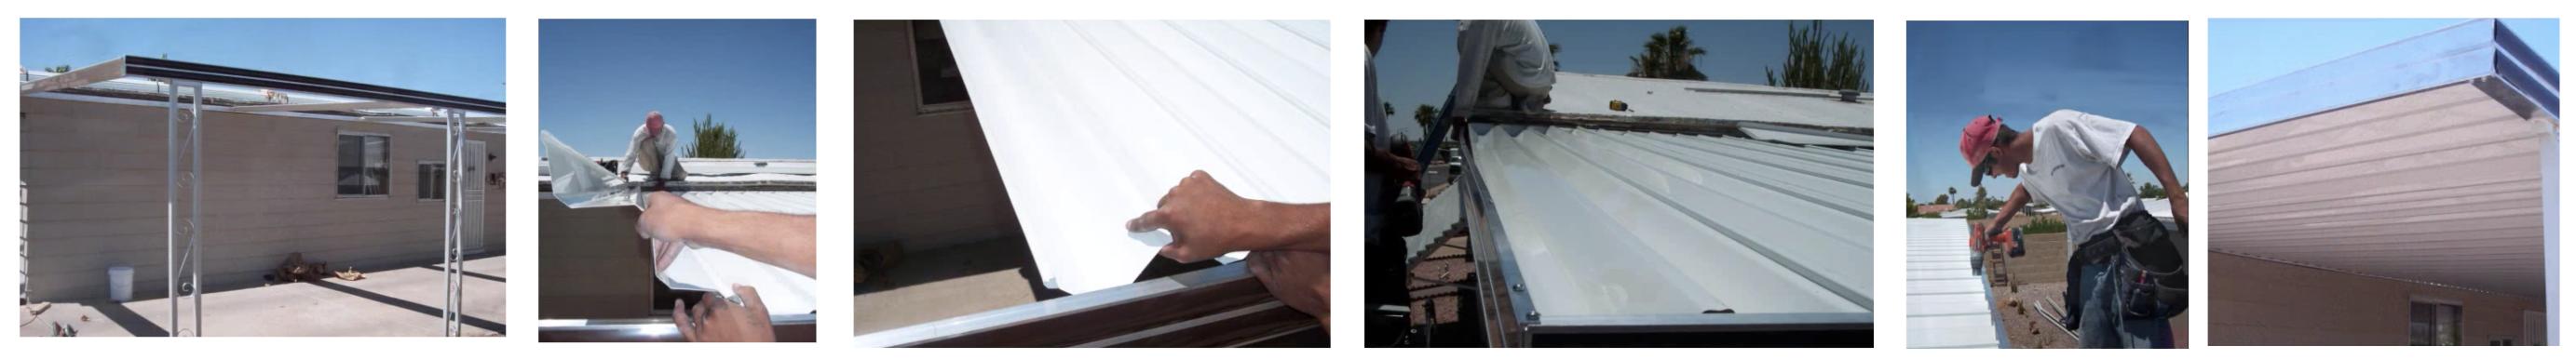 INstalling A Mobile Home Carport